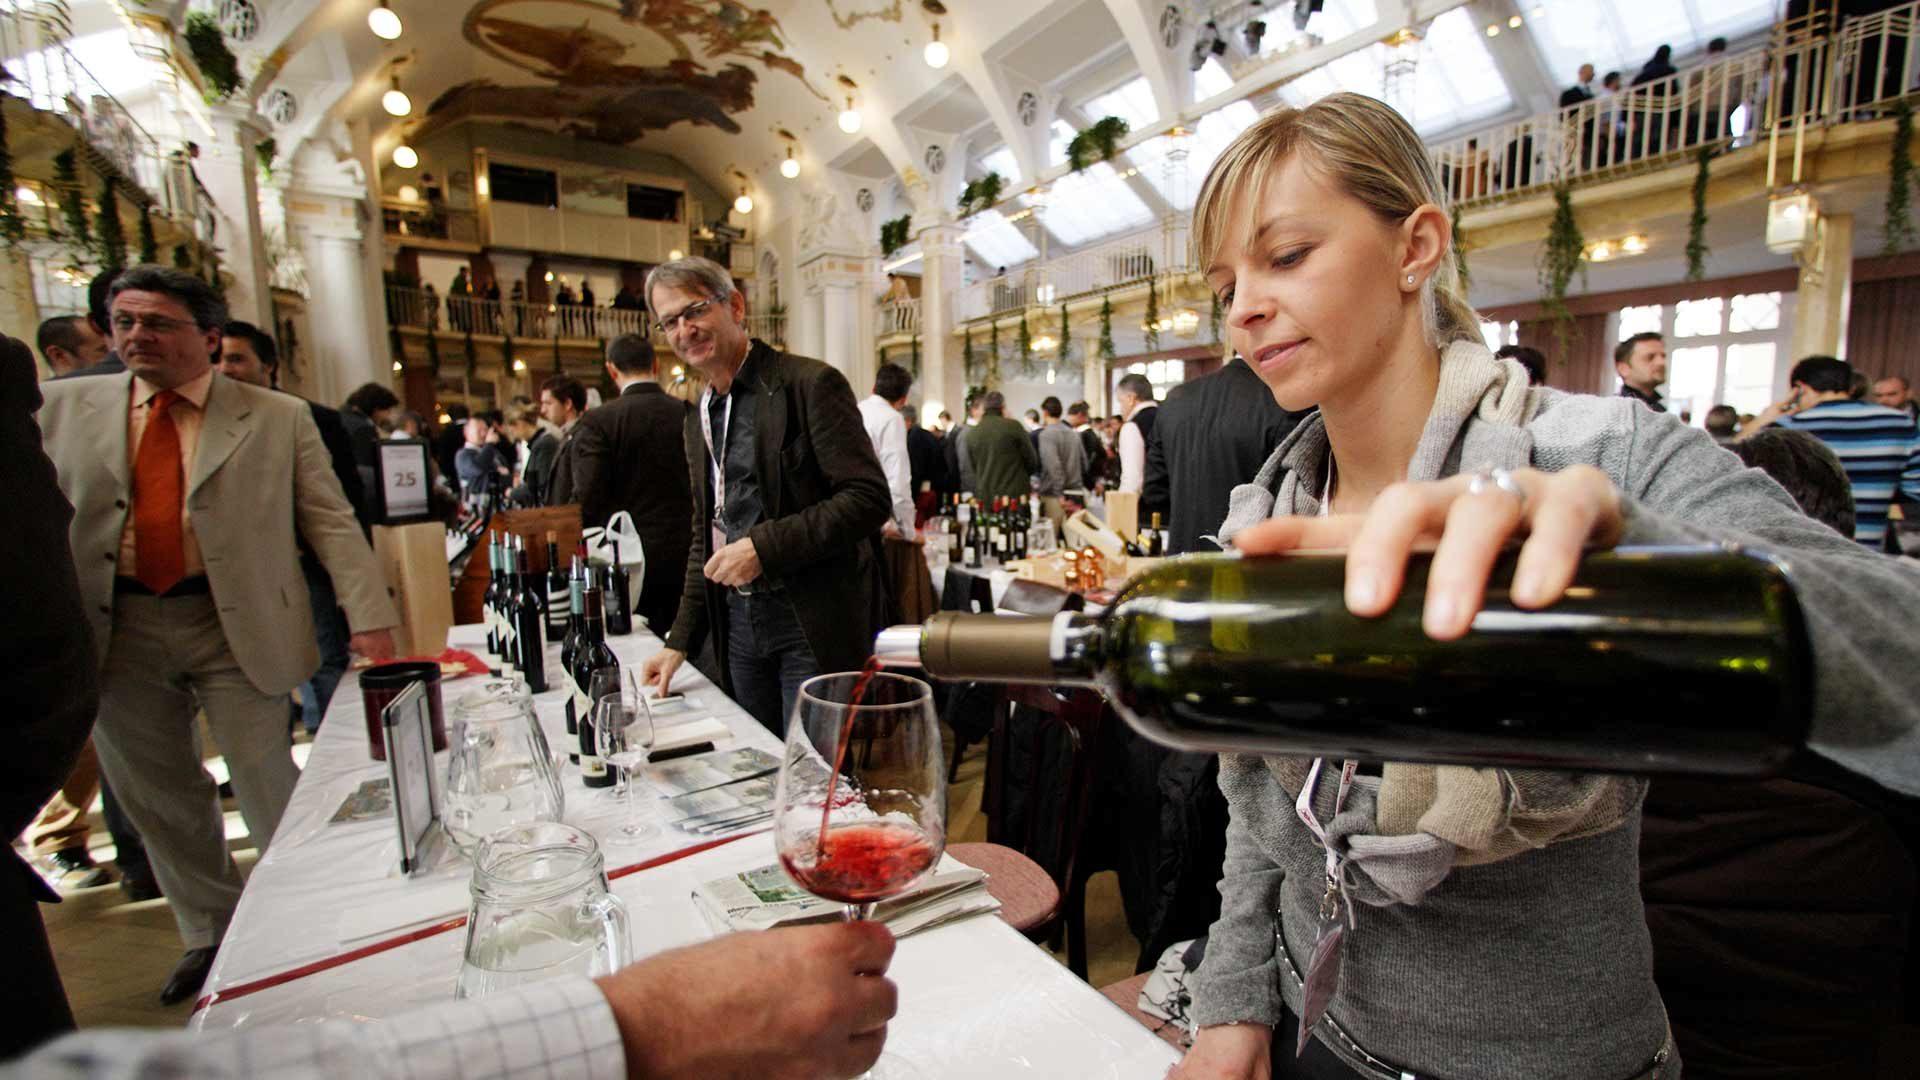 Winefestival a Merano